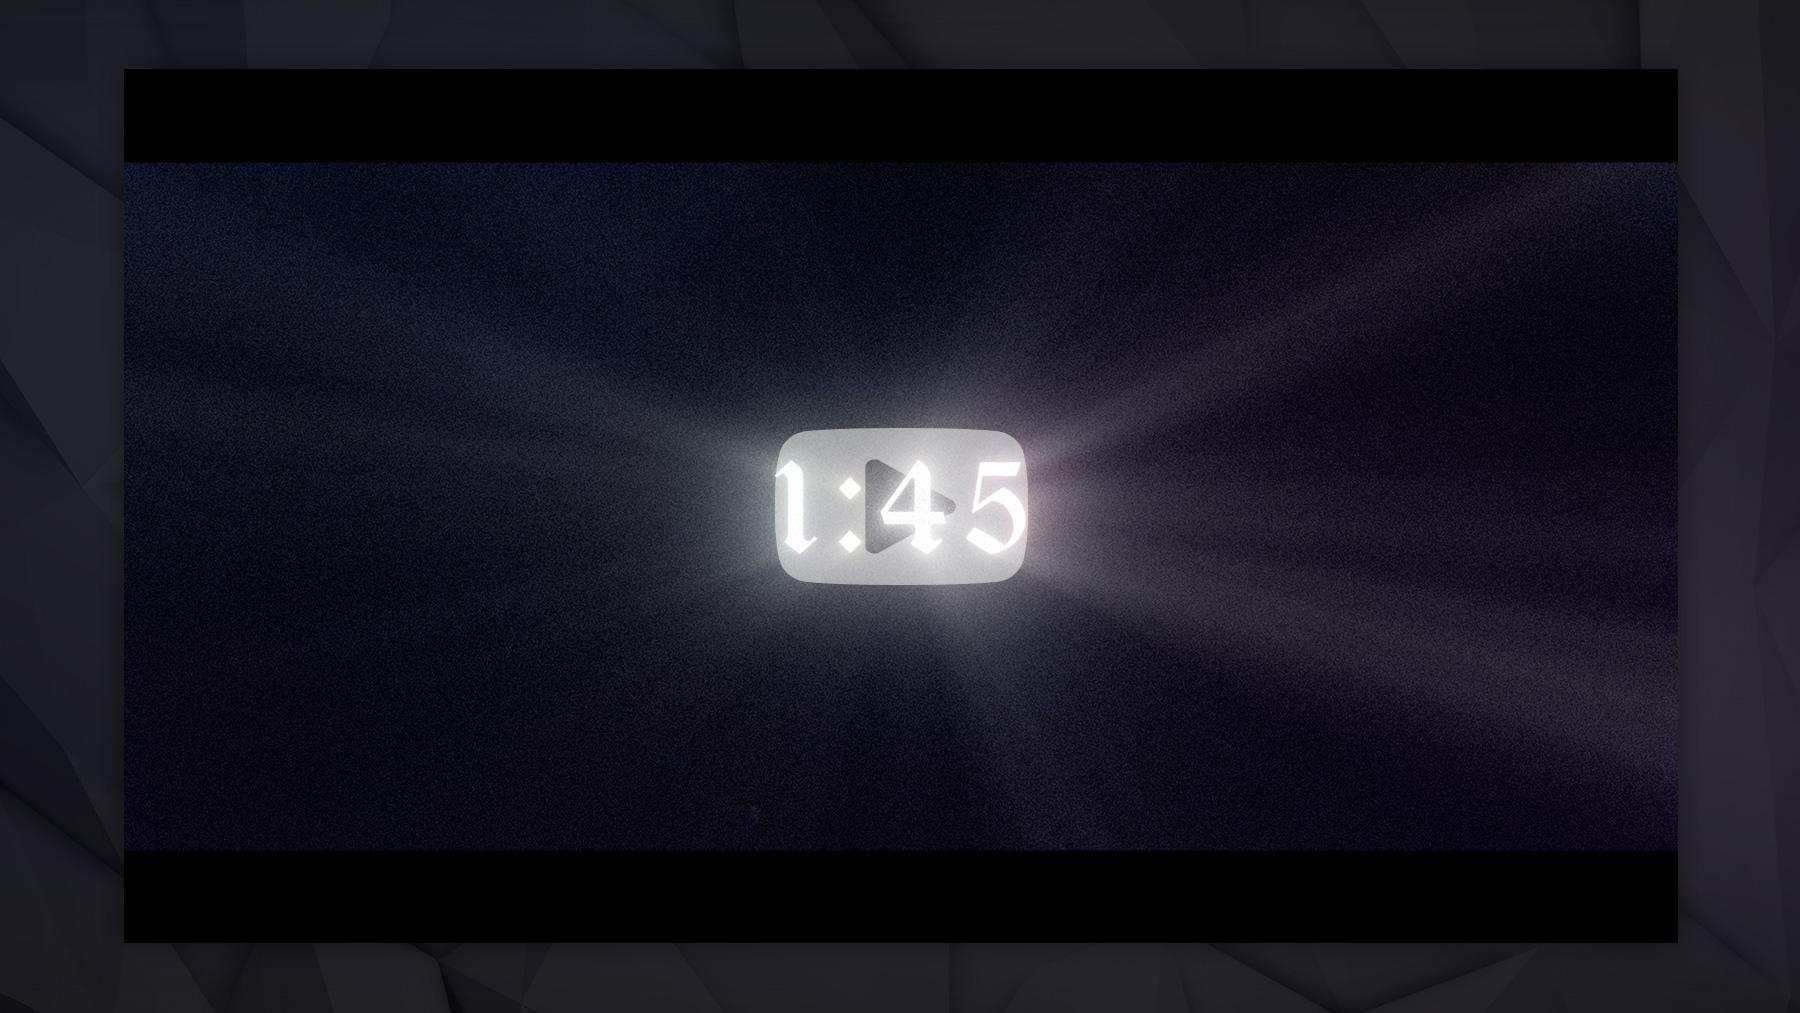 Eas4 Countdown Video